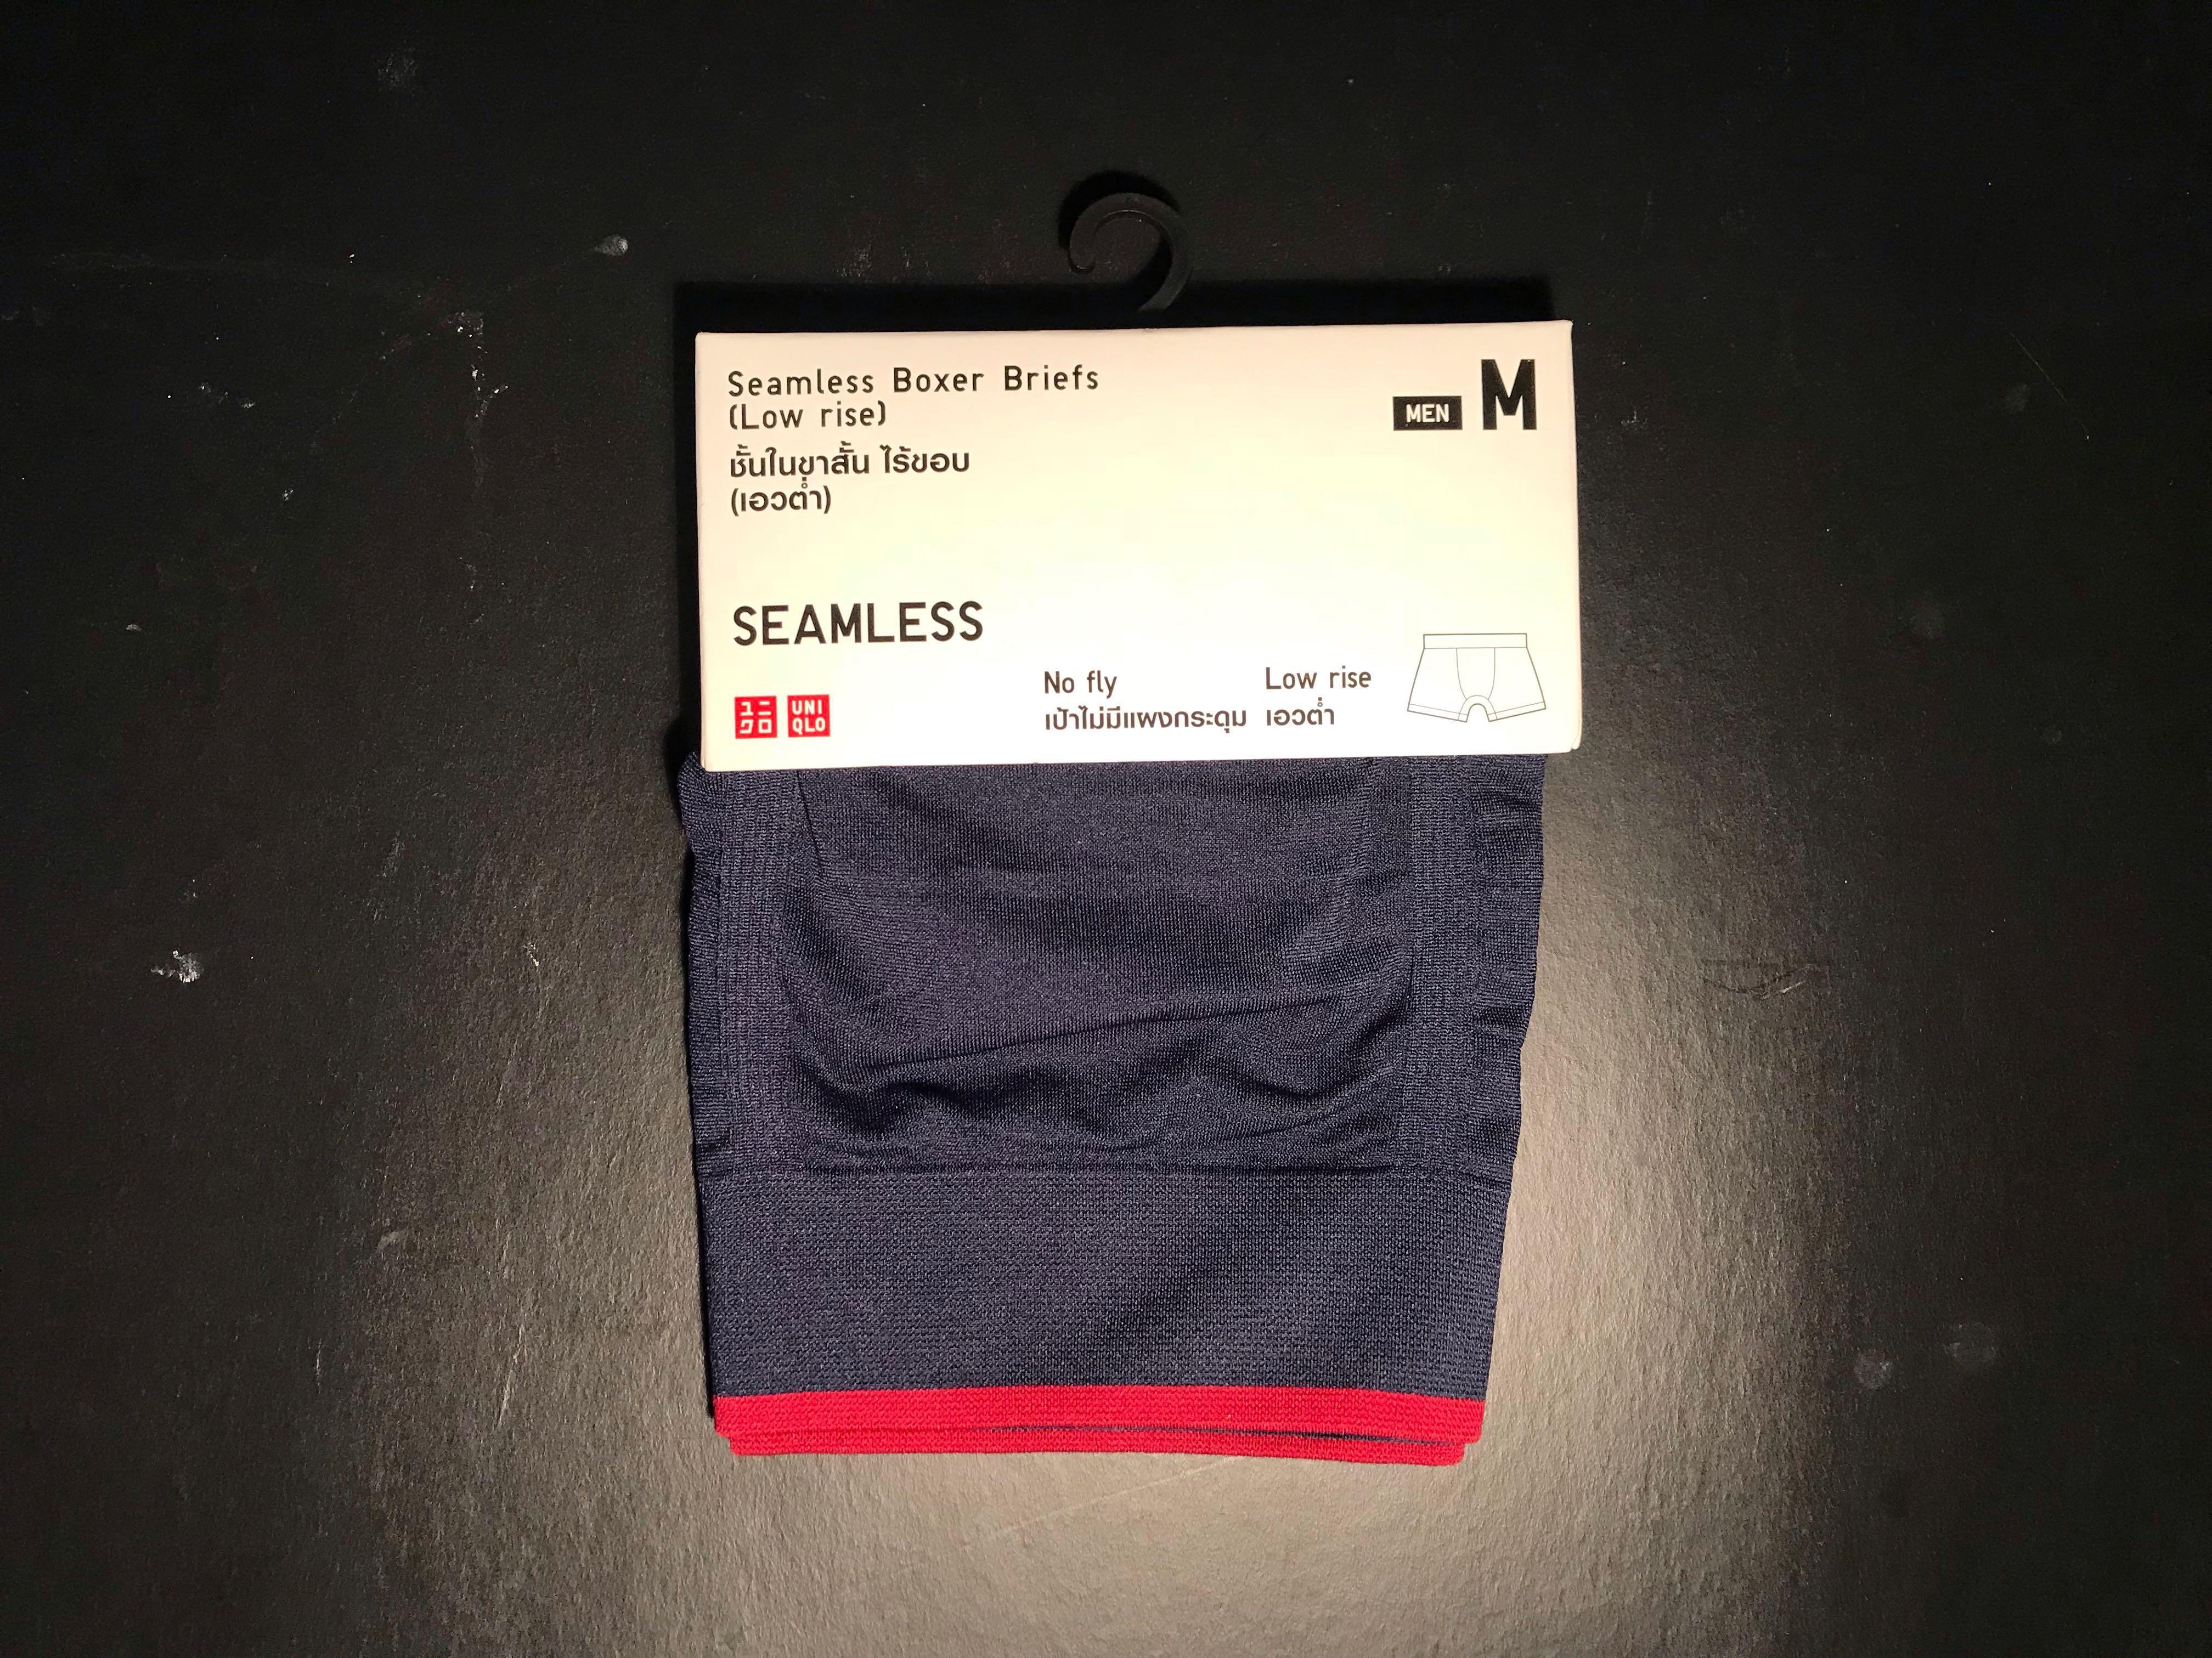 9bba05fb1dbe Uniqlo SEAMLESS Boxer Briefs, Men's Fashion, Clothes, Bottoms on ...